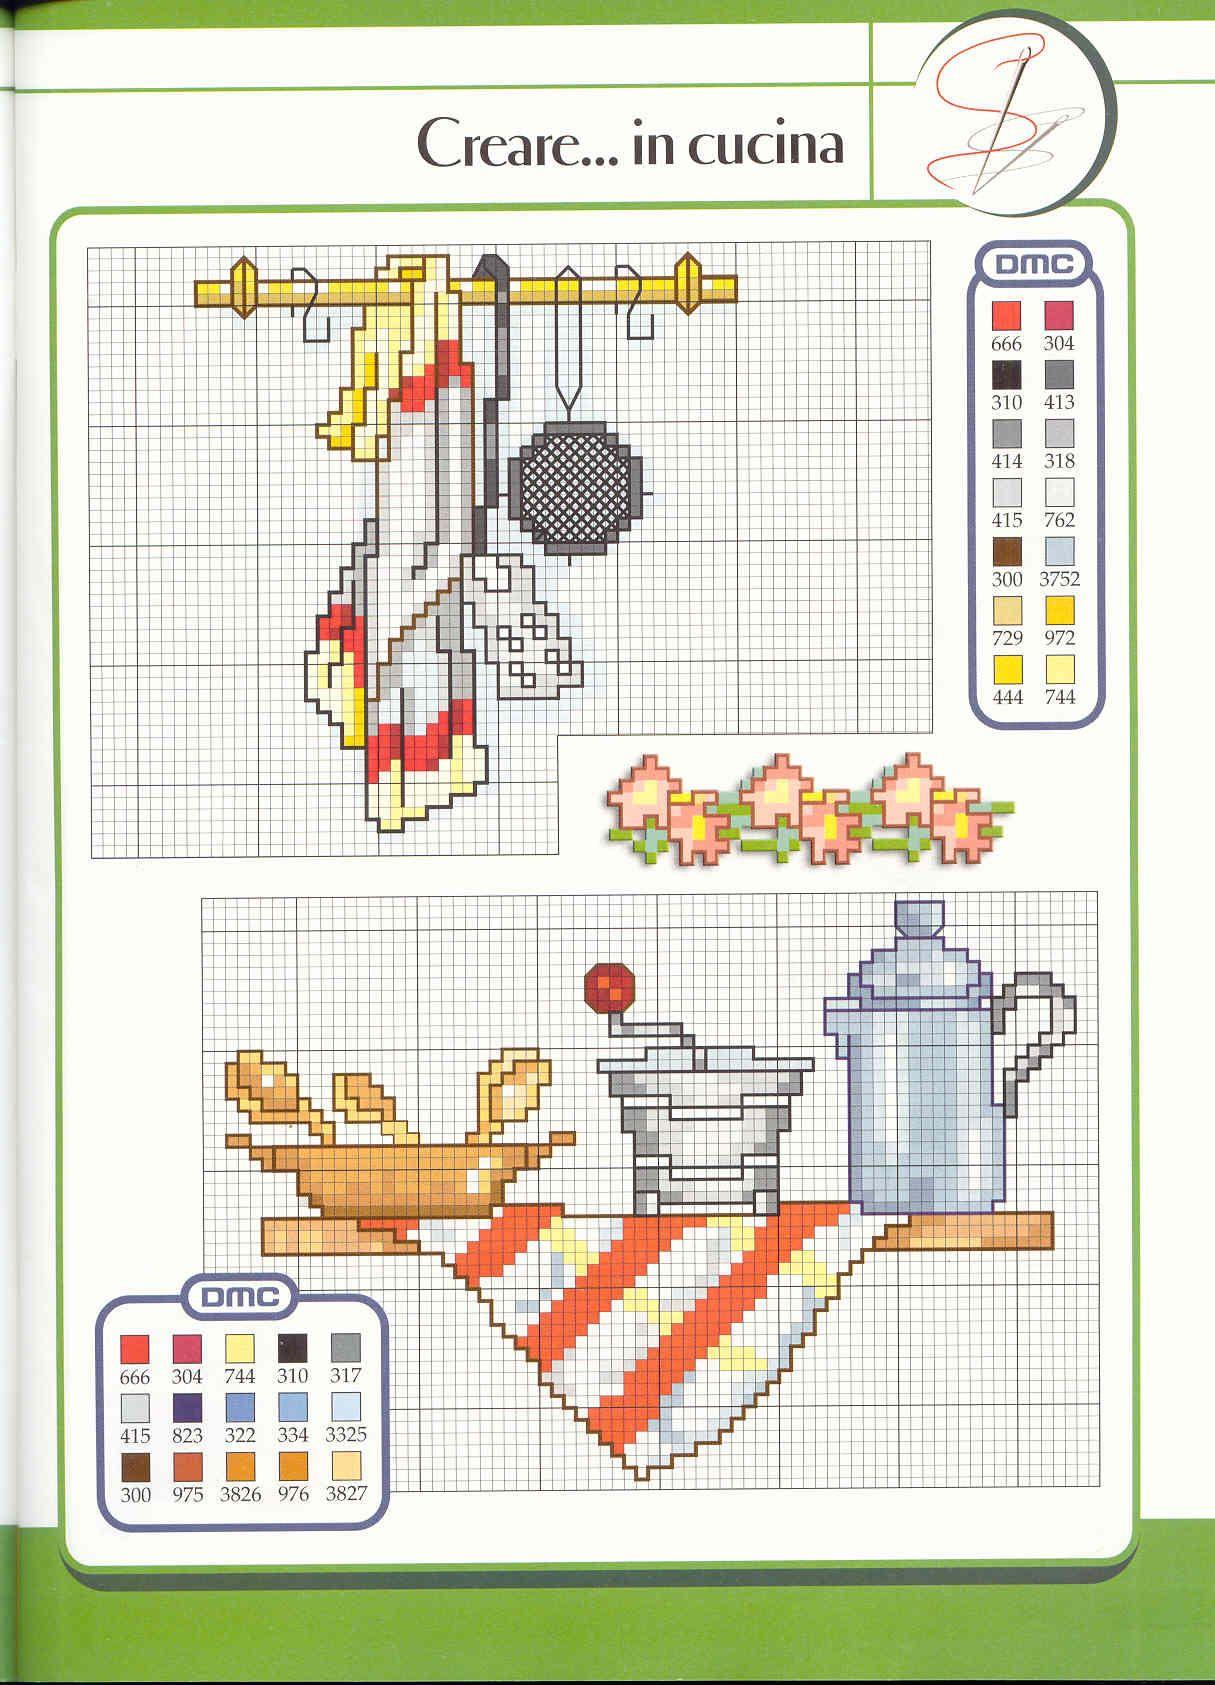 schema punto croce utensili cucina 02